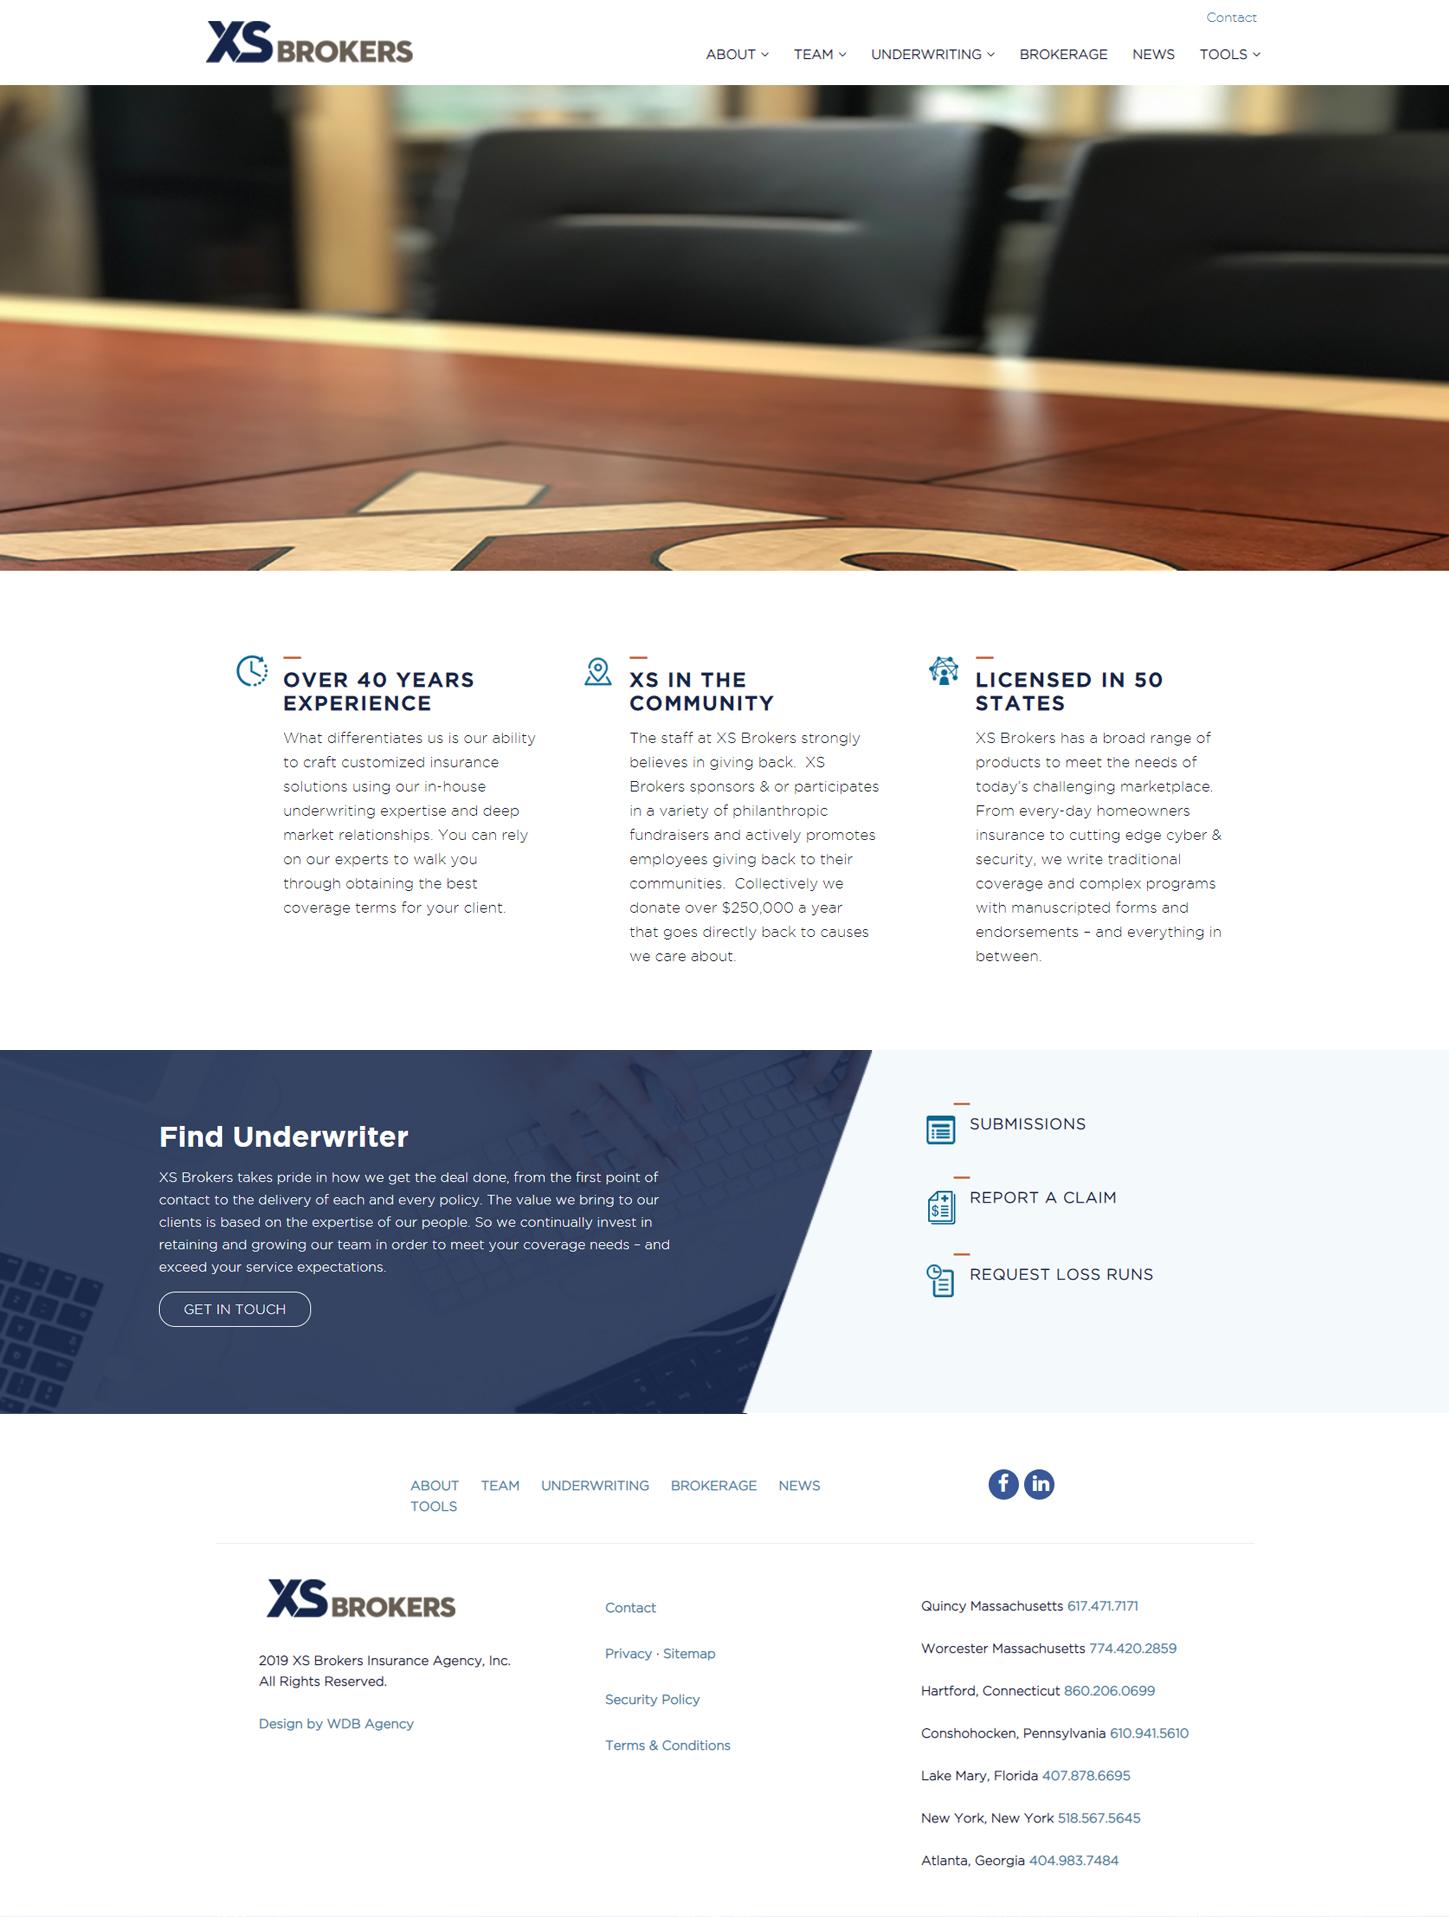 XSbrokers website development and design project